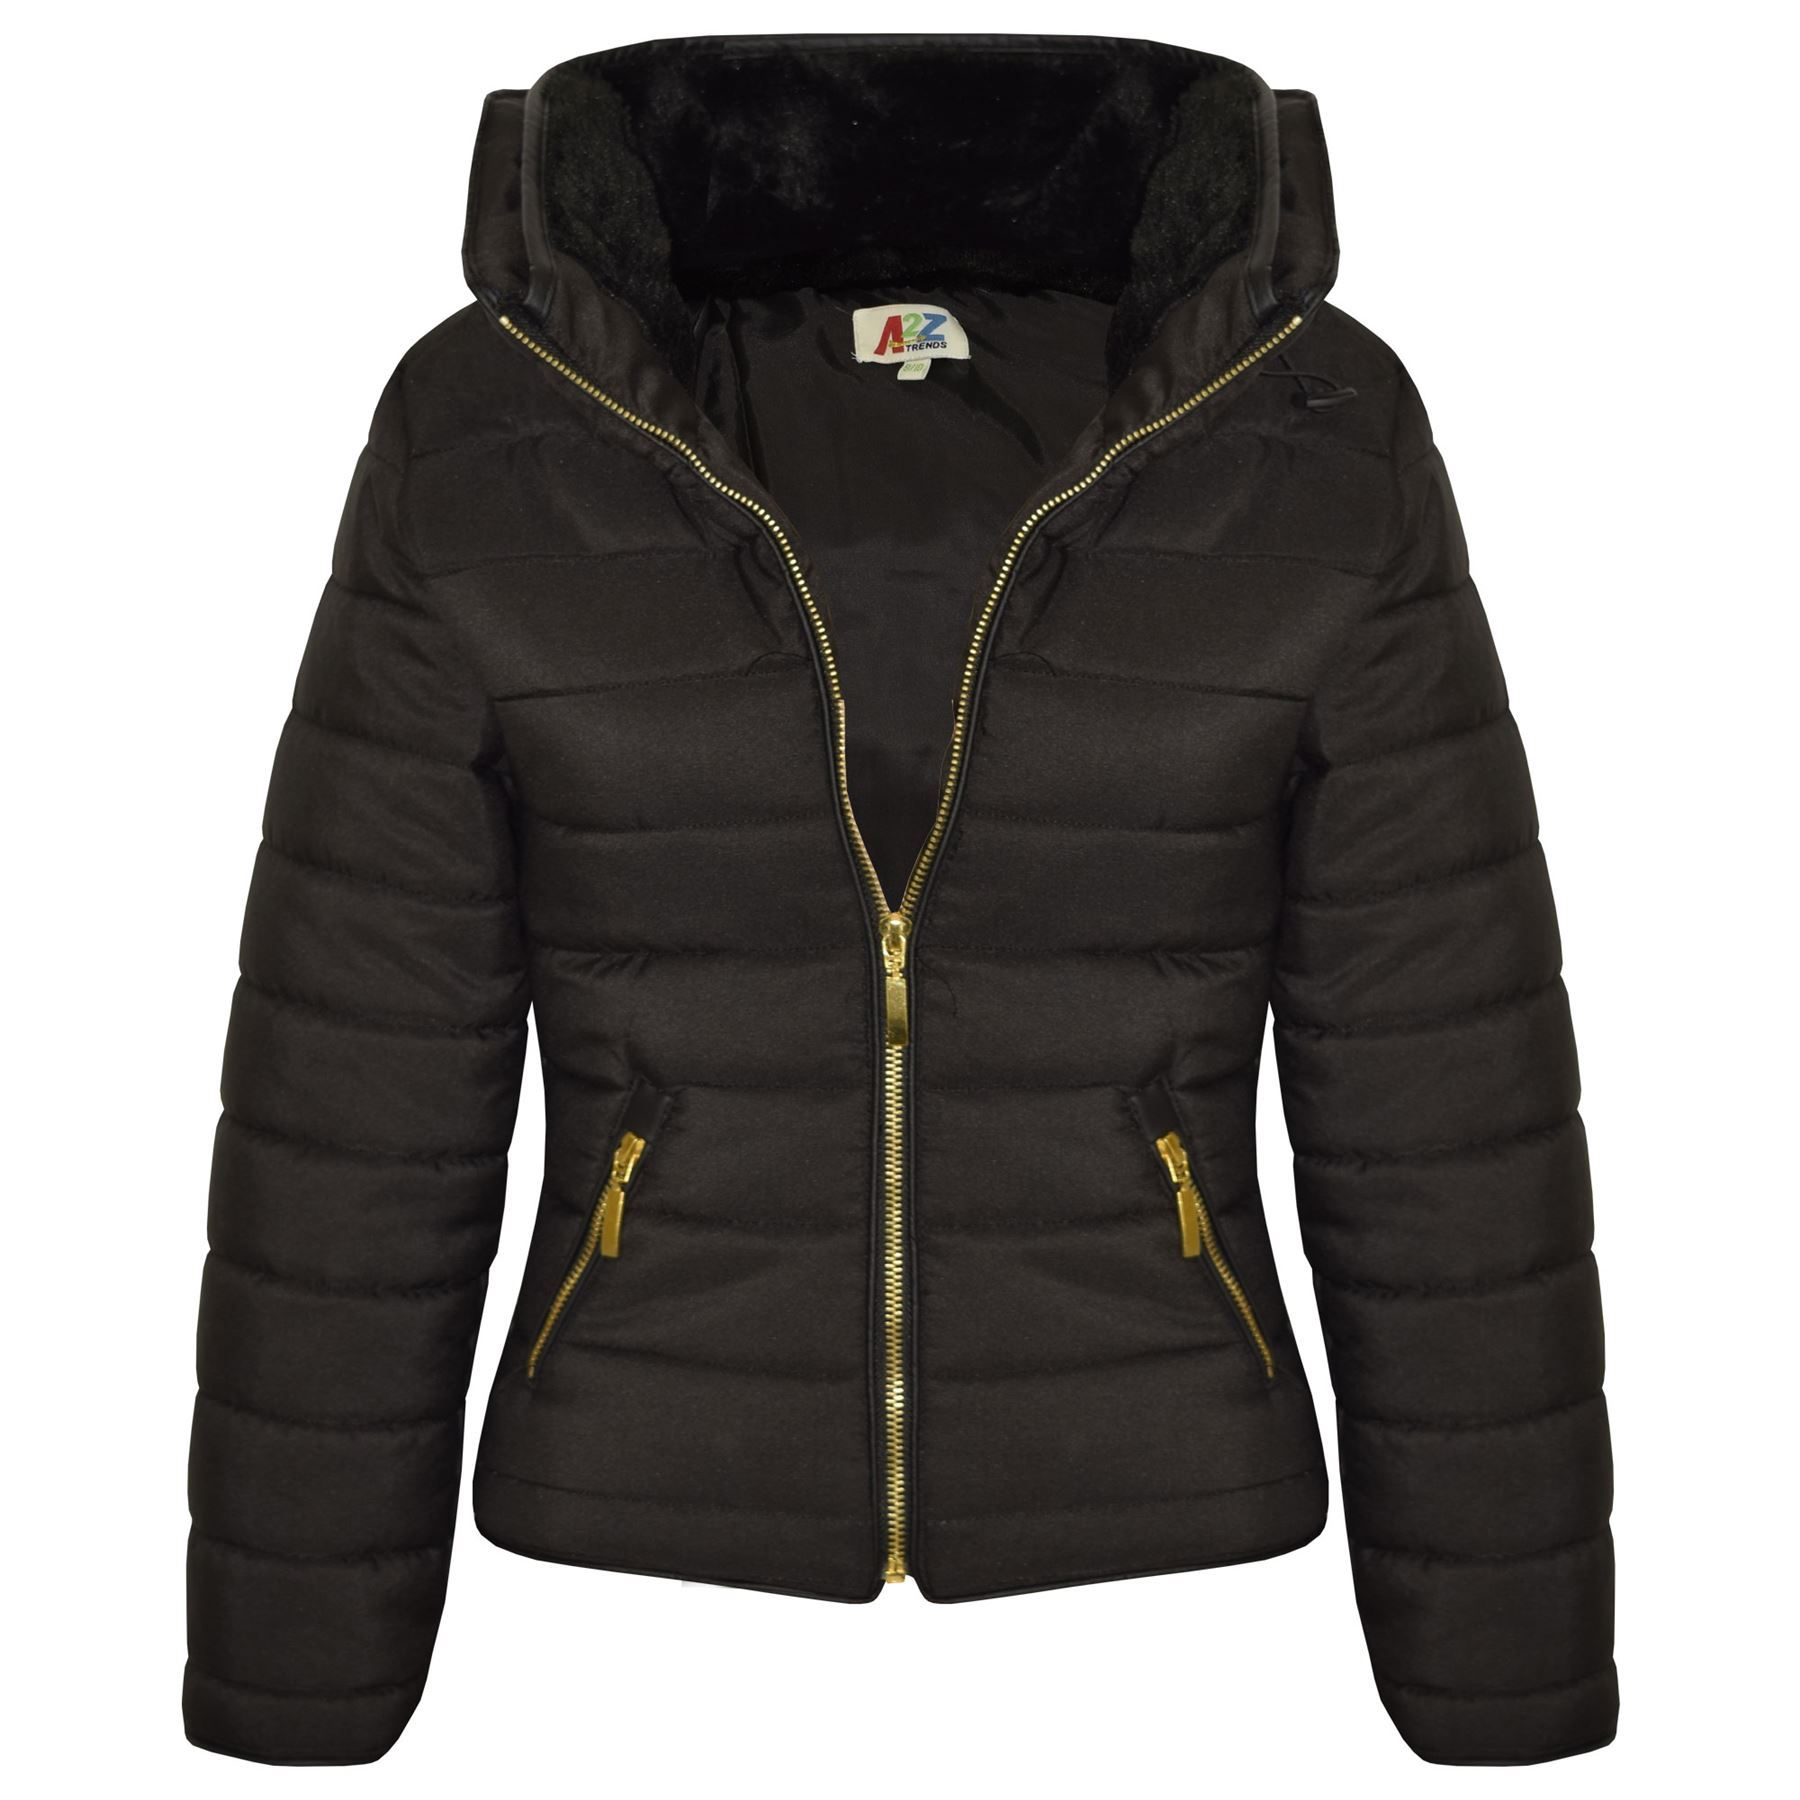 bubble coats girls-jacket-kids-padded-black-puffer-bubble-fur- TZINGQN